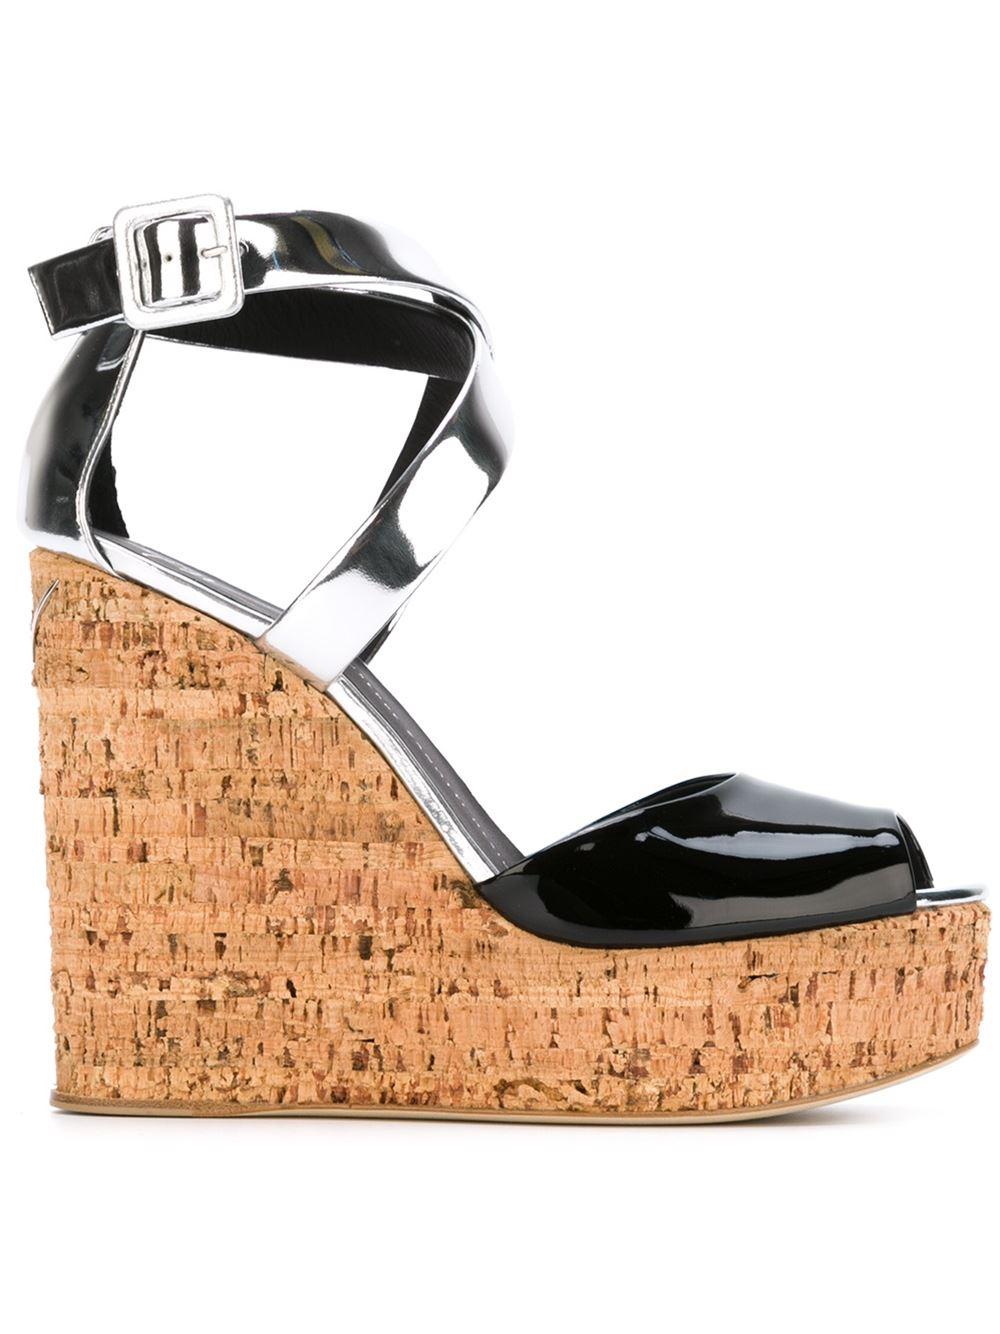 GIUSEPPE ZANOTTI Wedge sandals, FarFetch.com